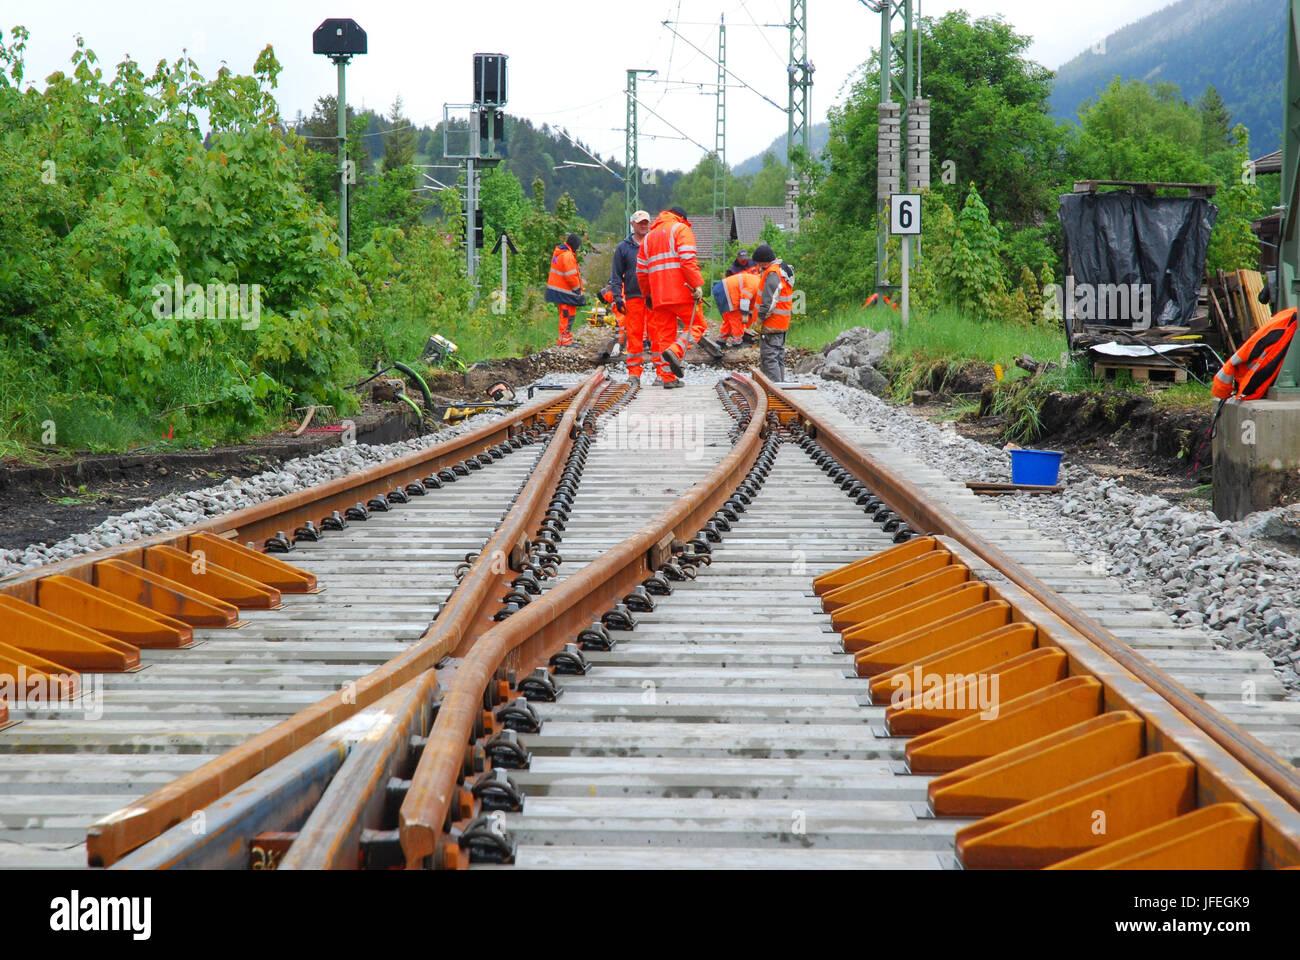 The German railways, track construction, railway worker, ballast renewal - Stock Image